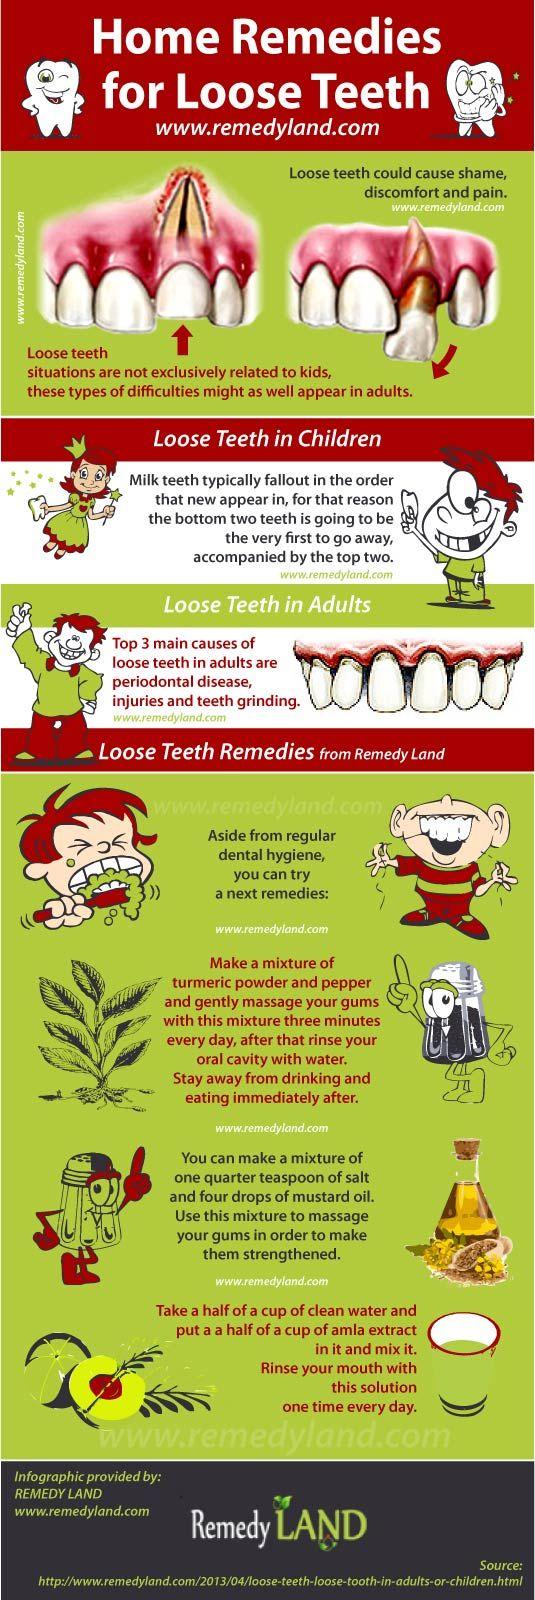 Loose teeth remedies #looseteeth #remedies http://www.remedyland.com/2013/04/loose-teeth-loose-tooth-in-adults-or-children.html